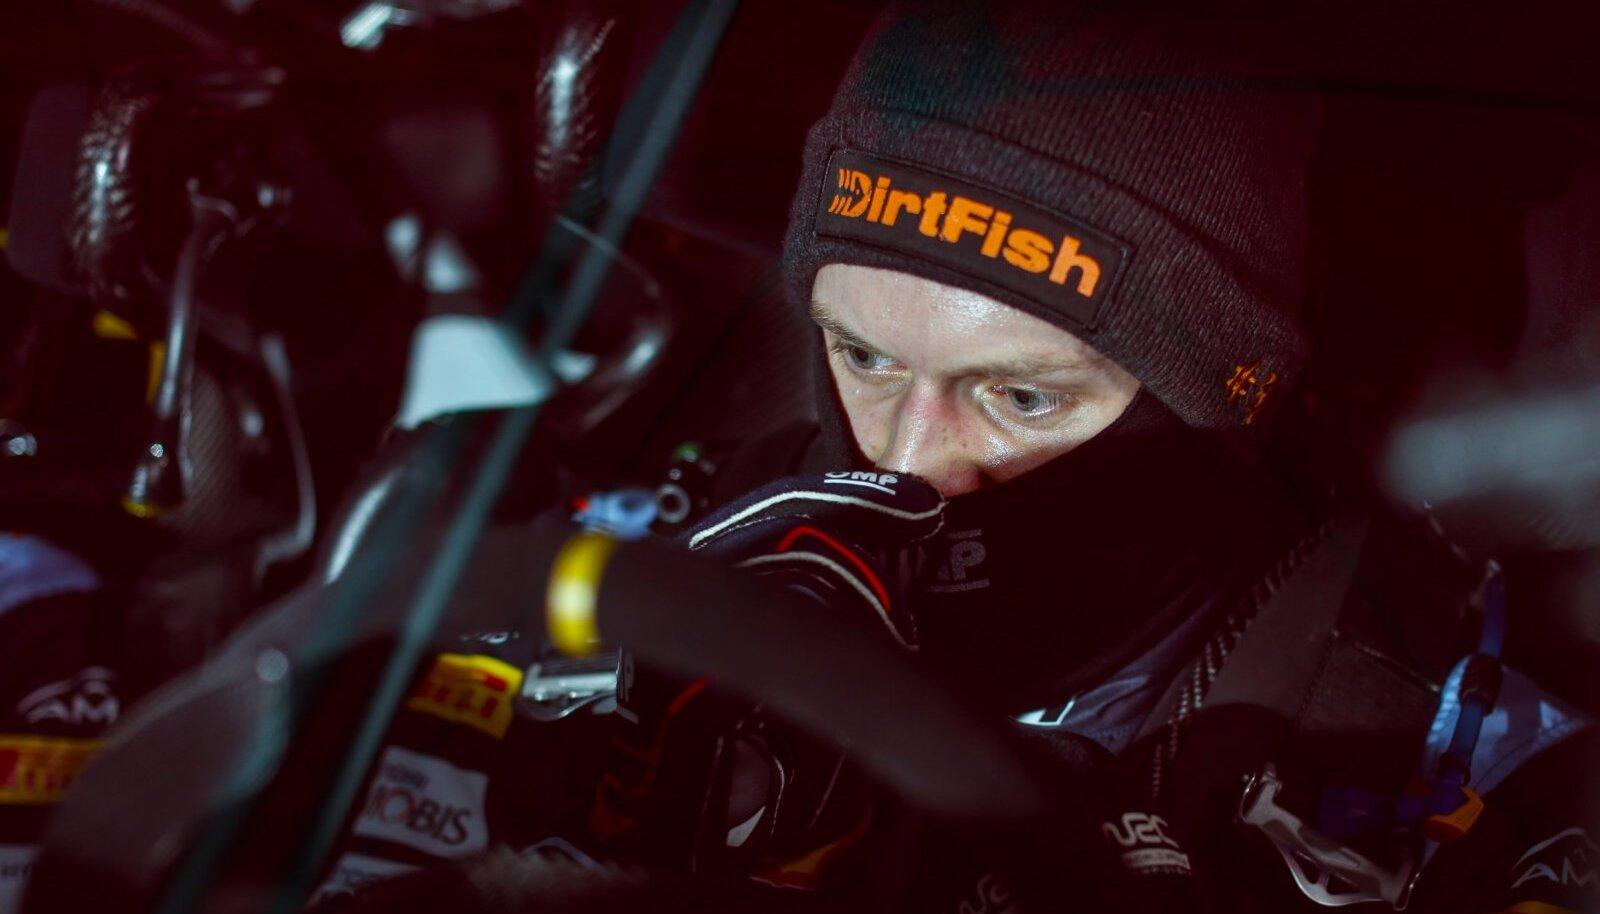 Rally - 2021 WRC World Rally Car Championship, Monte Carlo - Friday, monte carlo